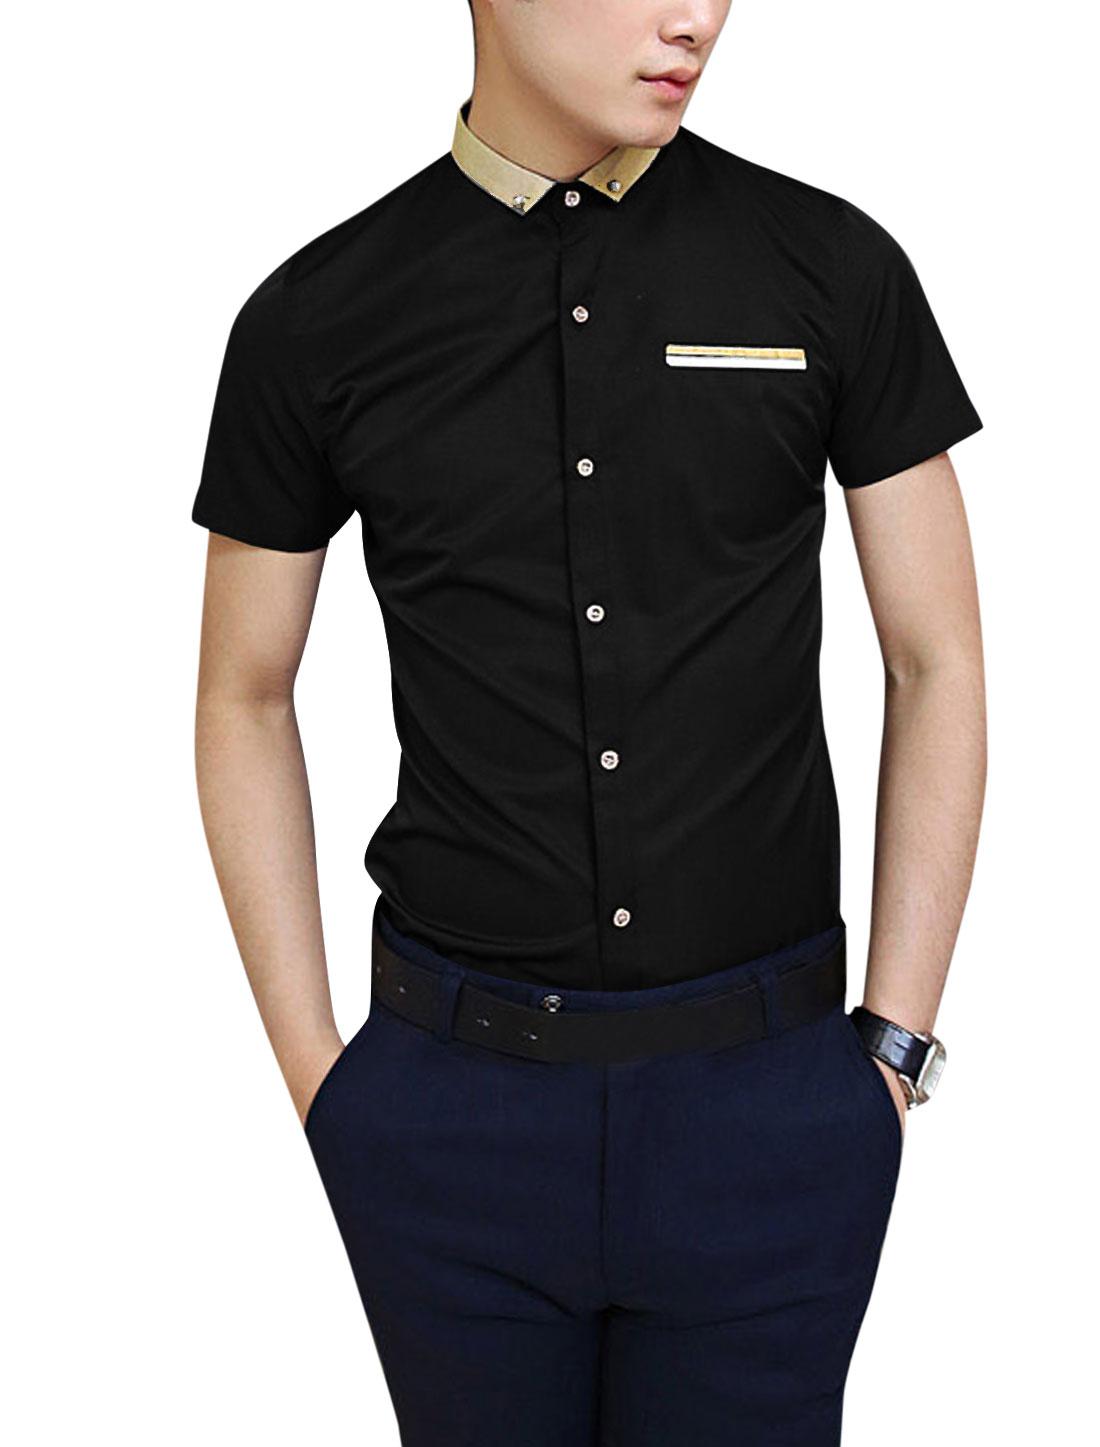 Man Point Collar Short Sleeves Button Down Chic Black Shirt M